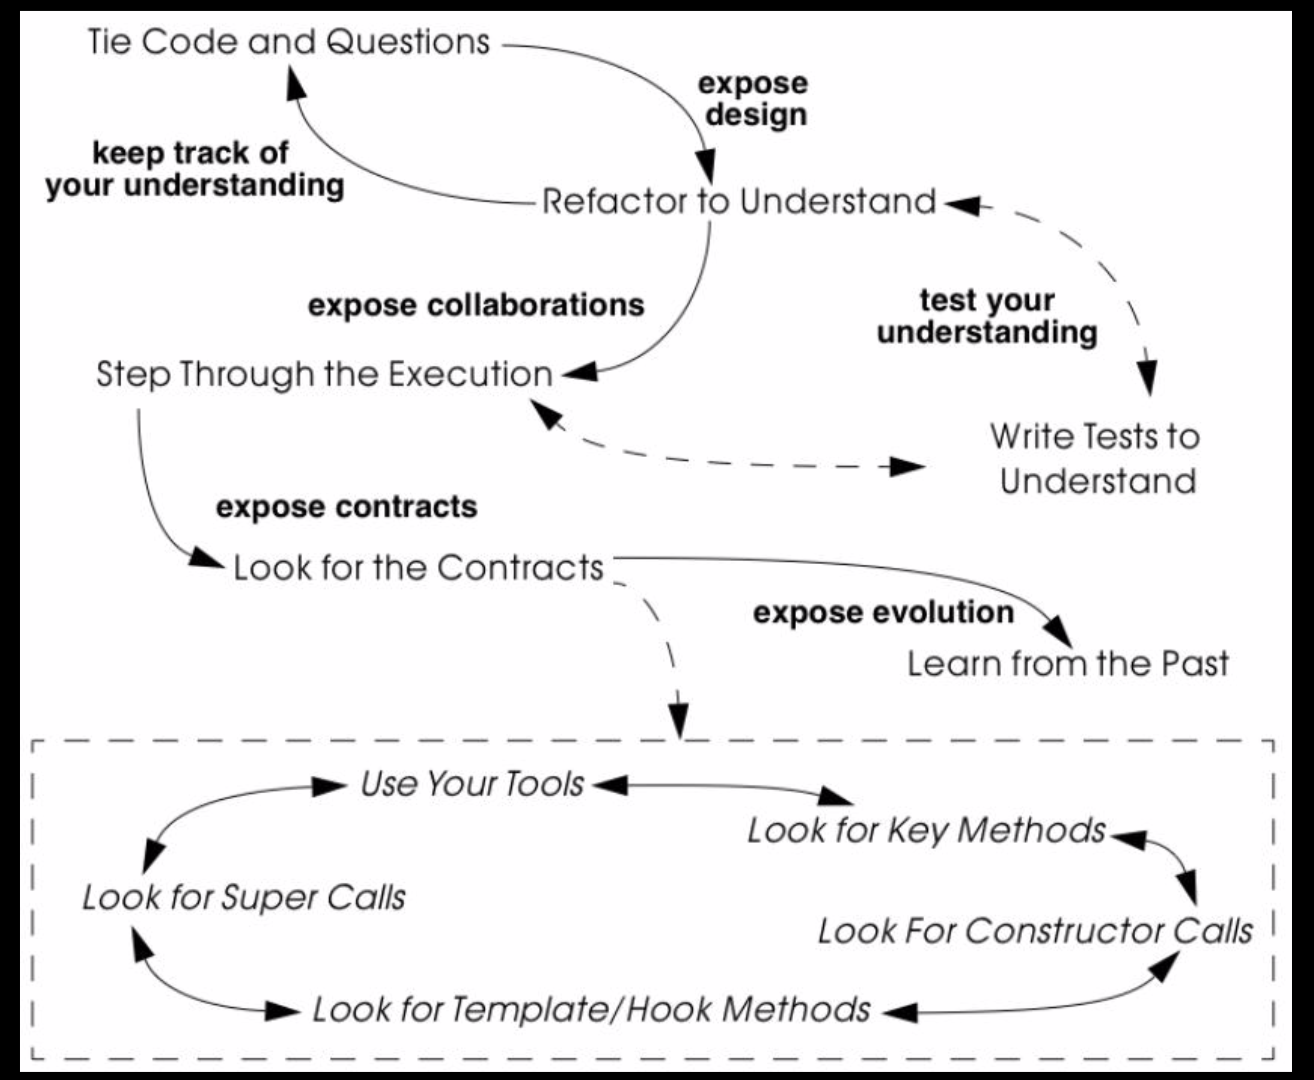 read_code2